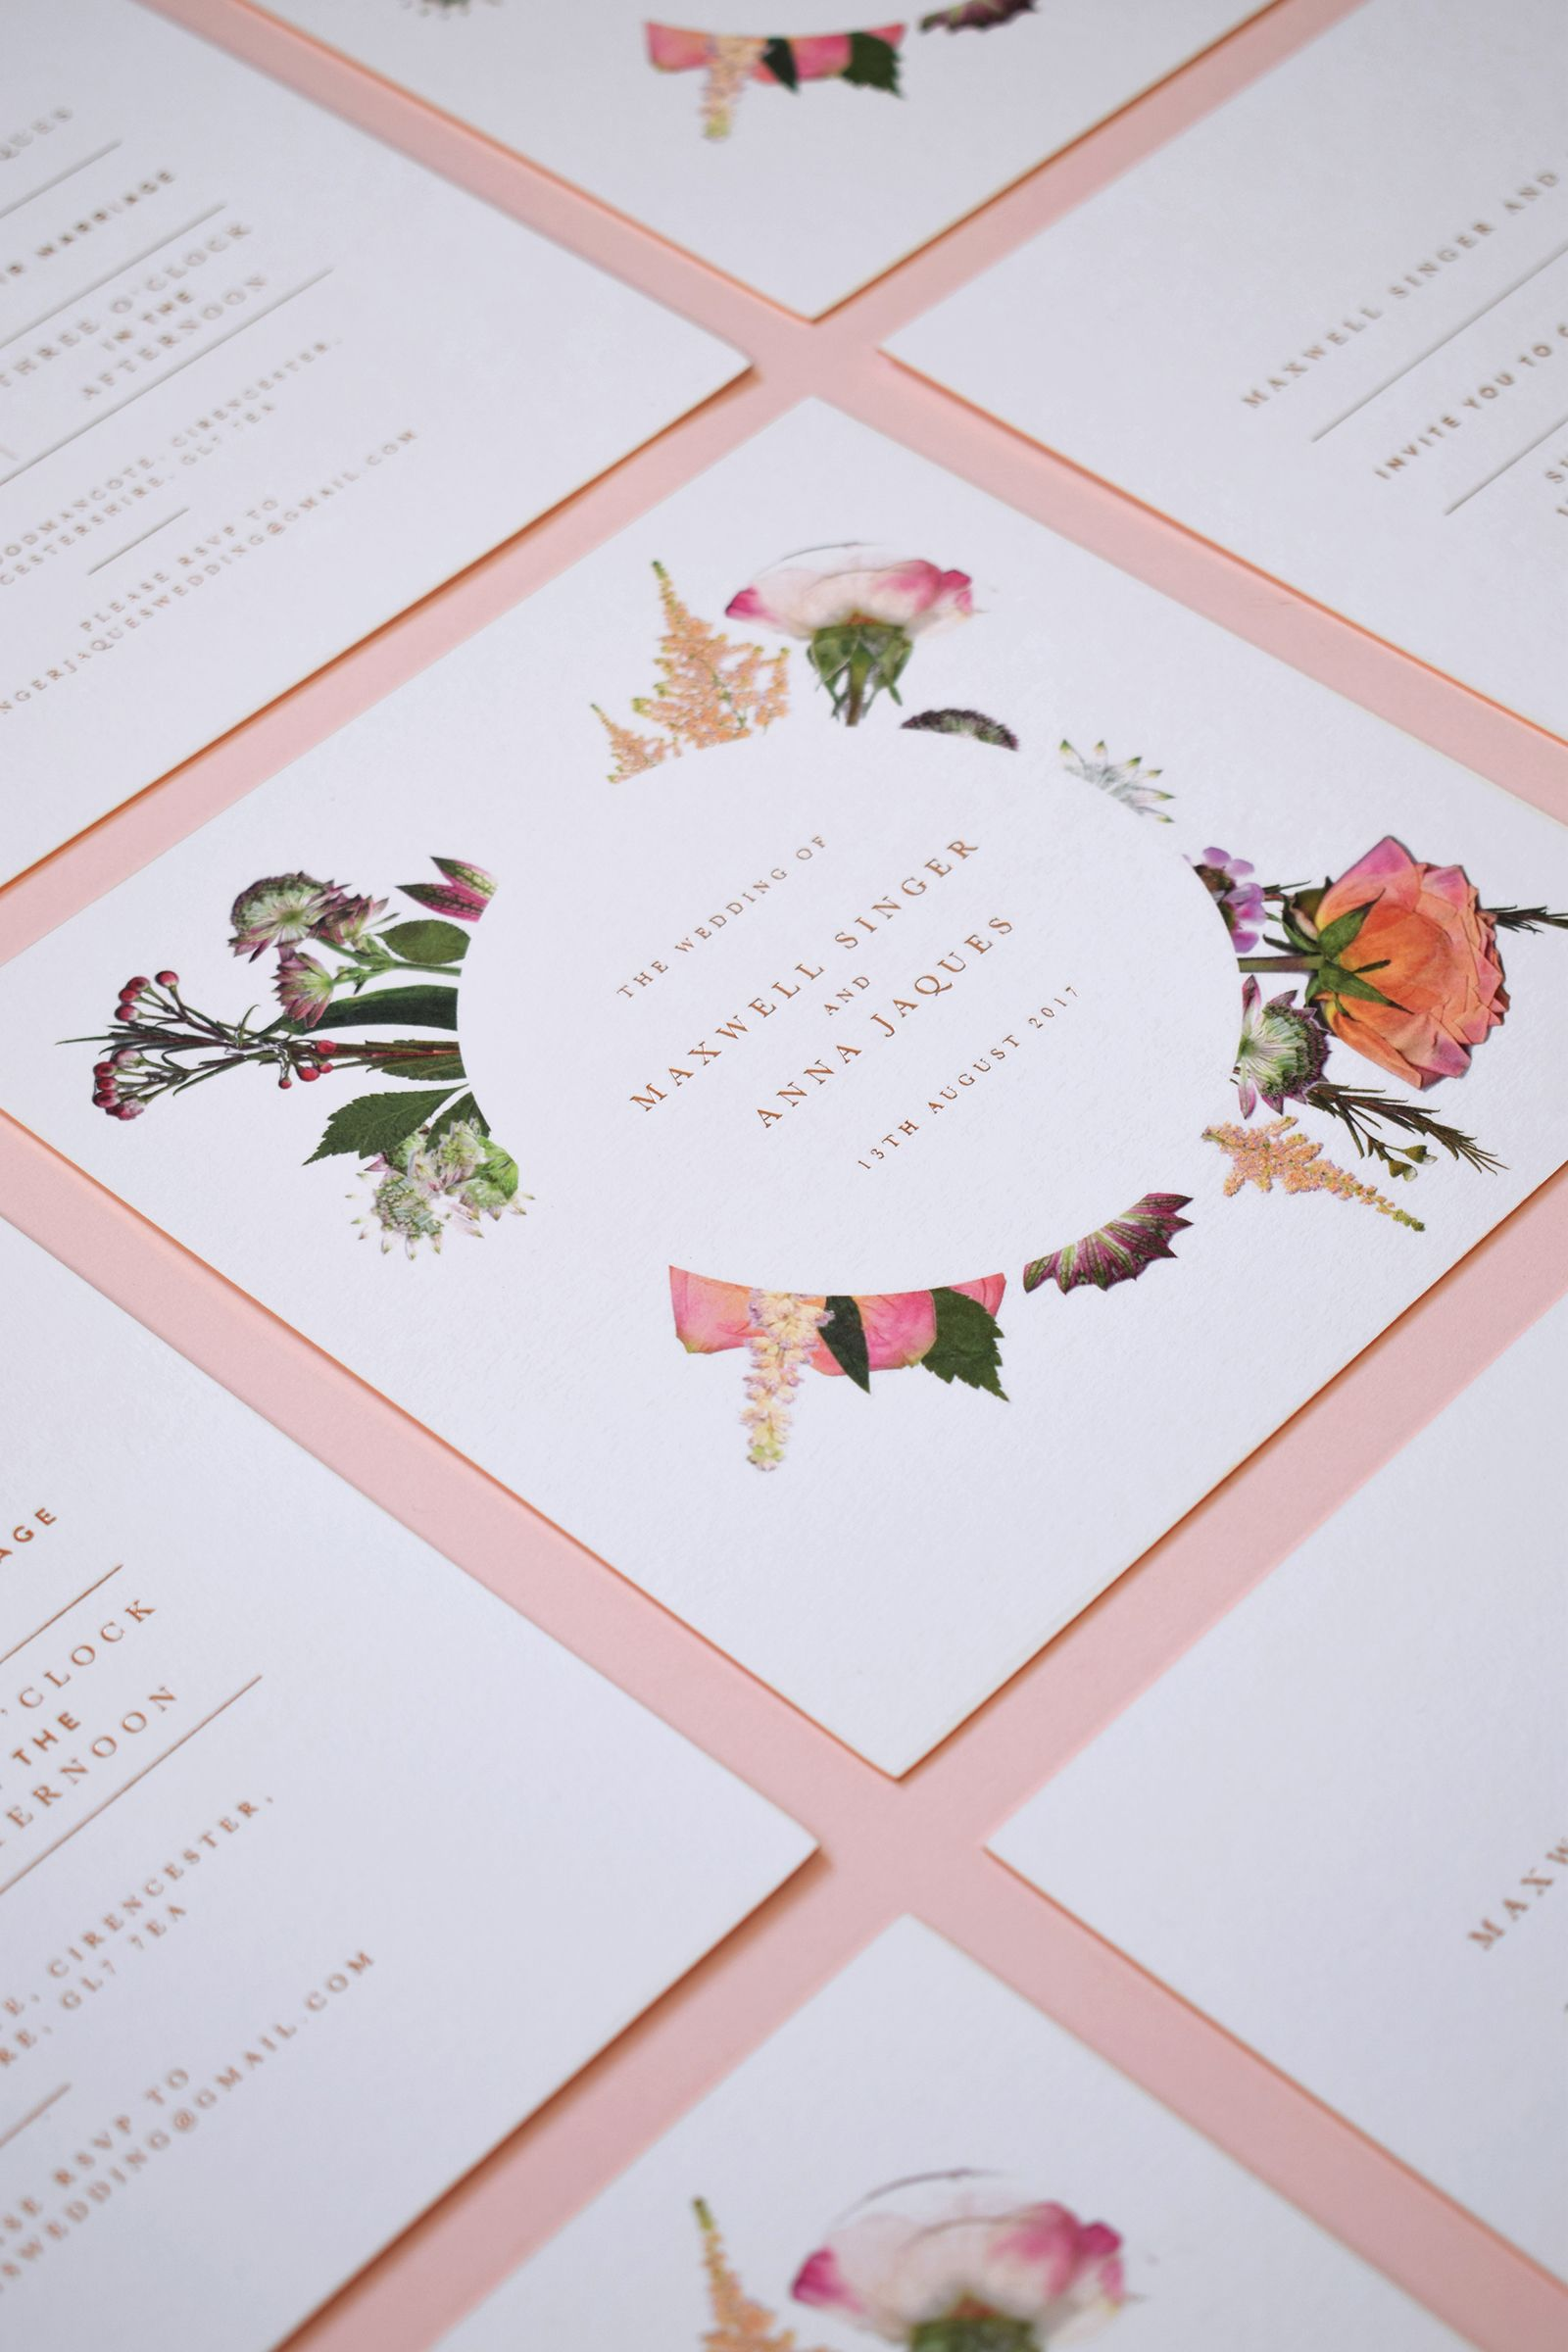 Pressed flower wedding invitations from nicety studio follow us on pressed flower wedding invitations from nicety studio follow us on instagram nicetystudio stopboris Gallery